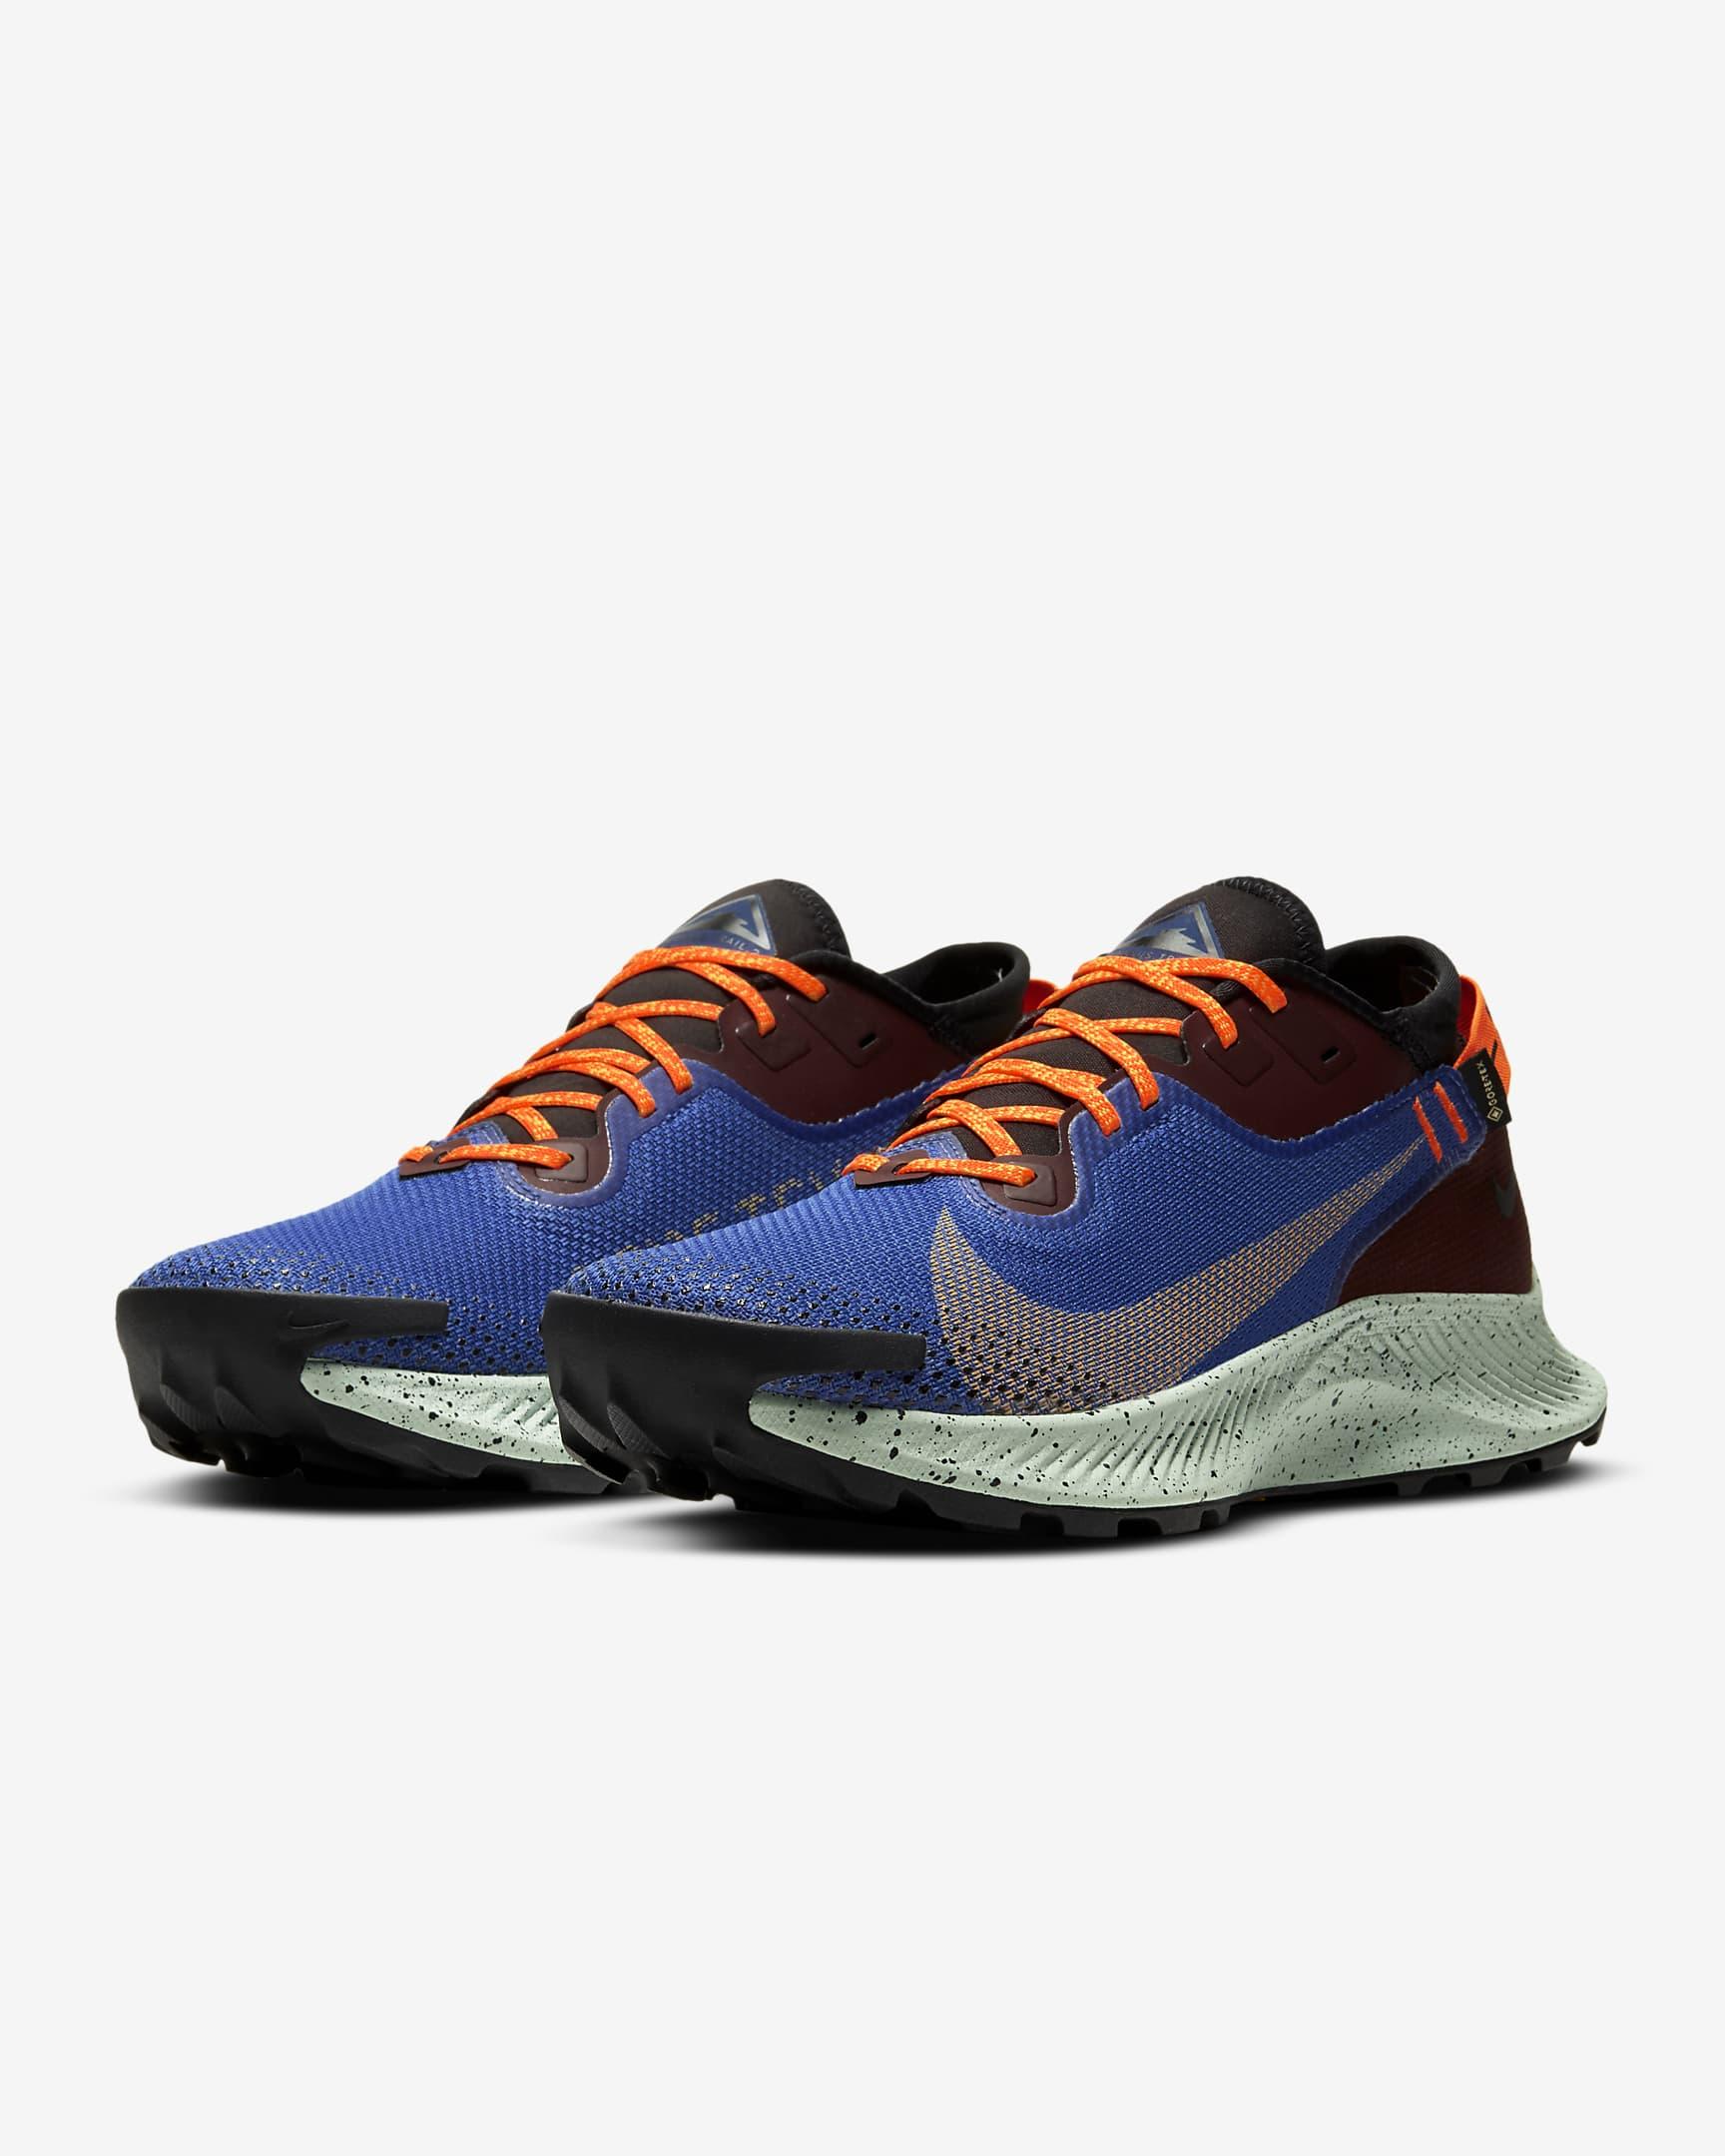 Best Nike Winter Accessories